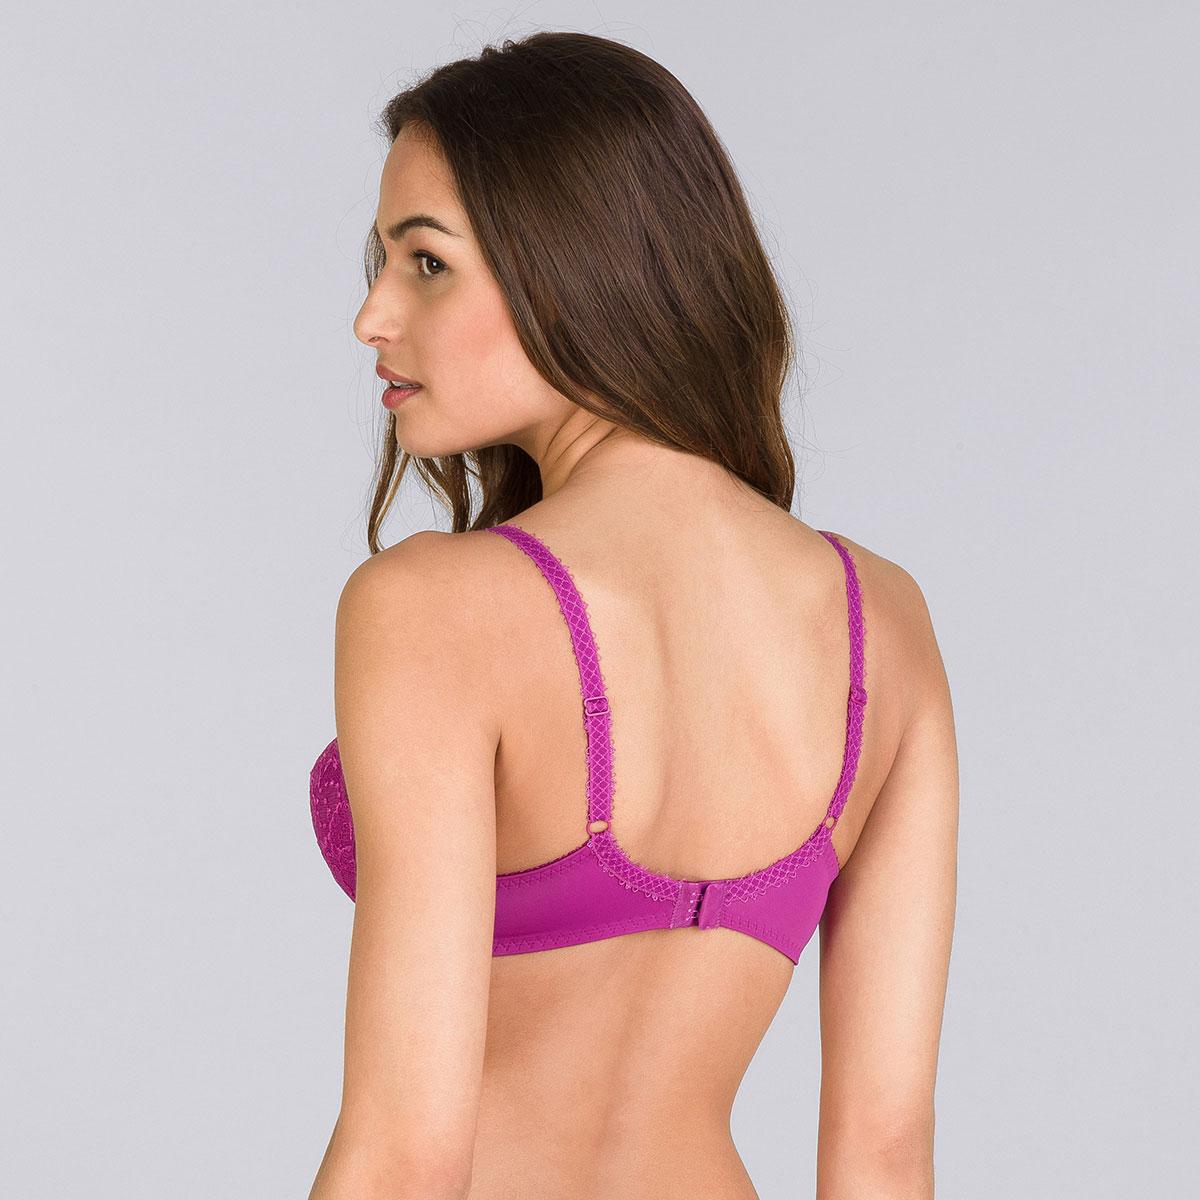 Soutien-gorge emboîtant violet fushia - Flower Elegance-PLAYTEX